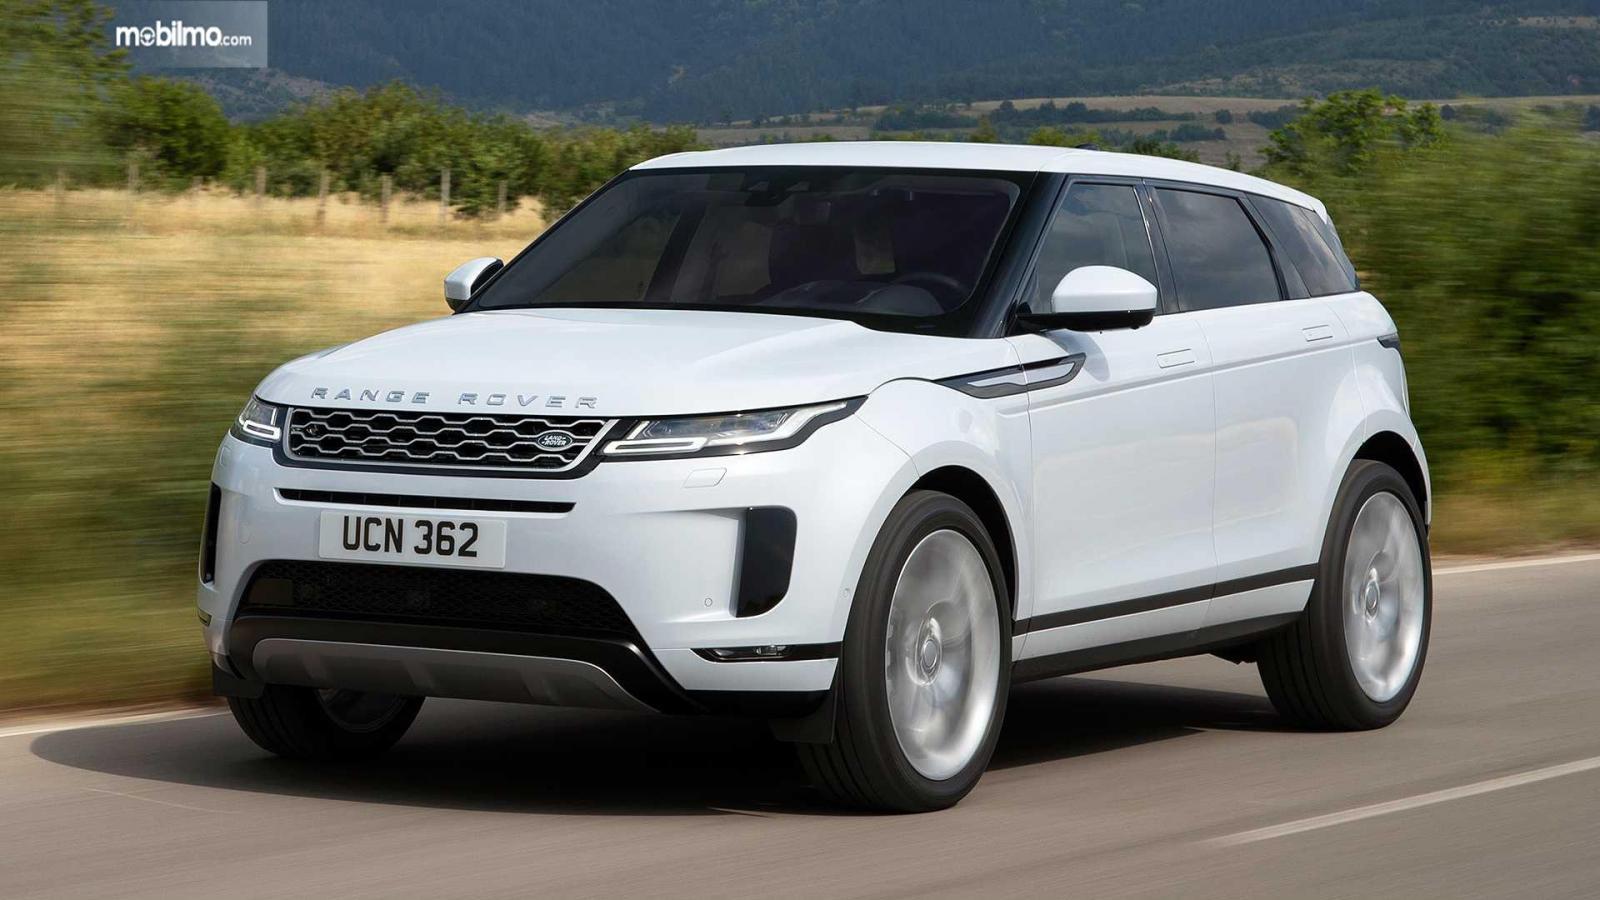 Gambar perjalanan Land Rover Range Rover 2019